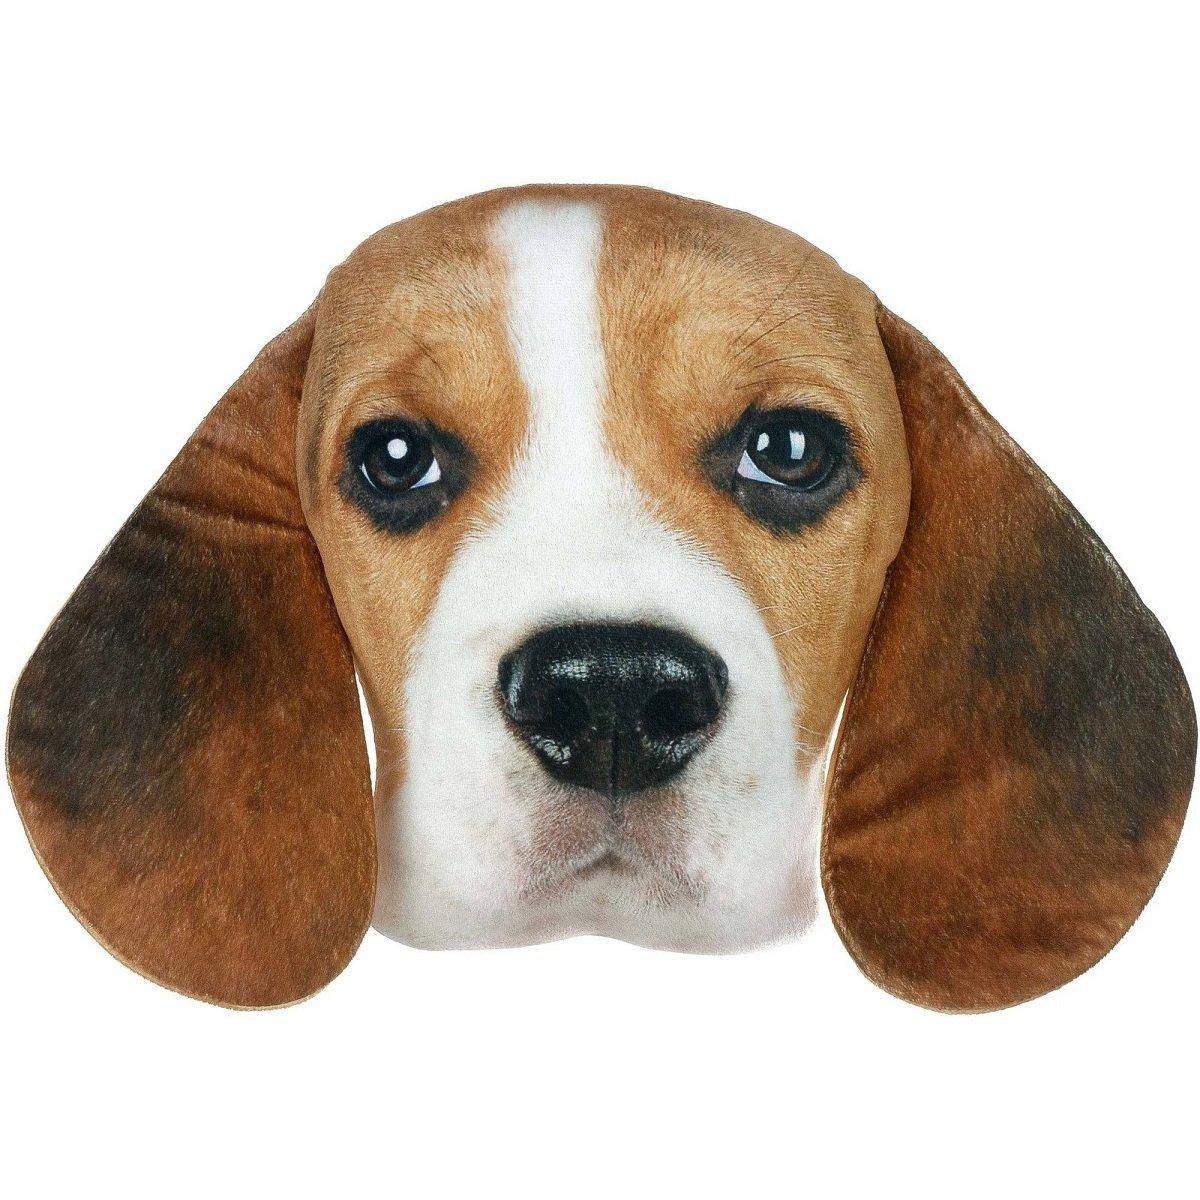 amazoncom almar beagle plush pillow  x  x  toys  games -